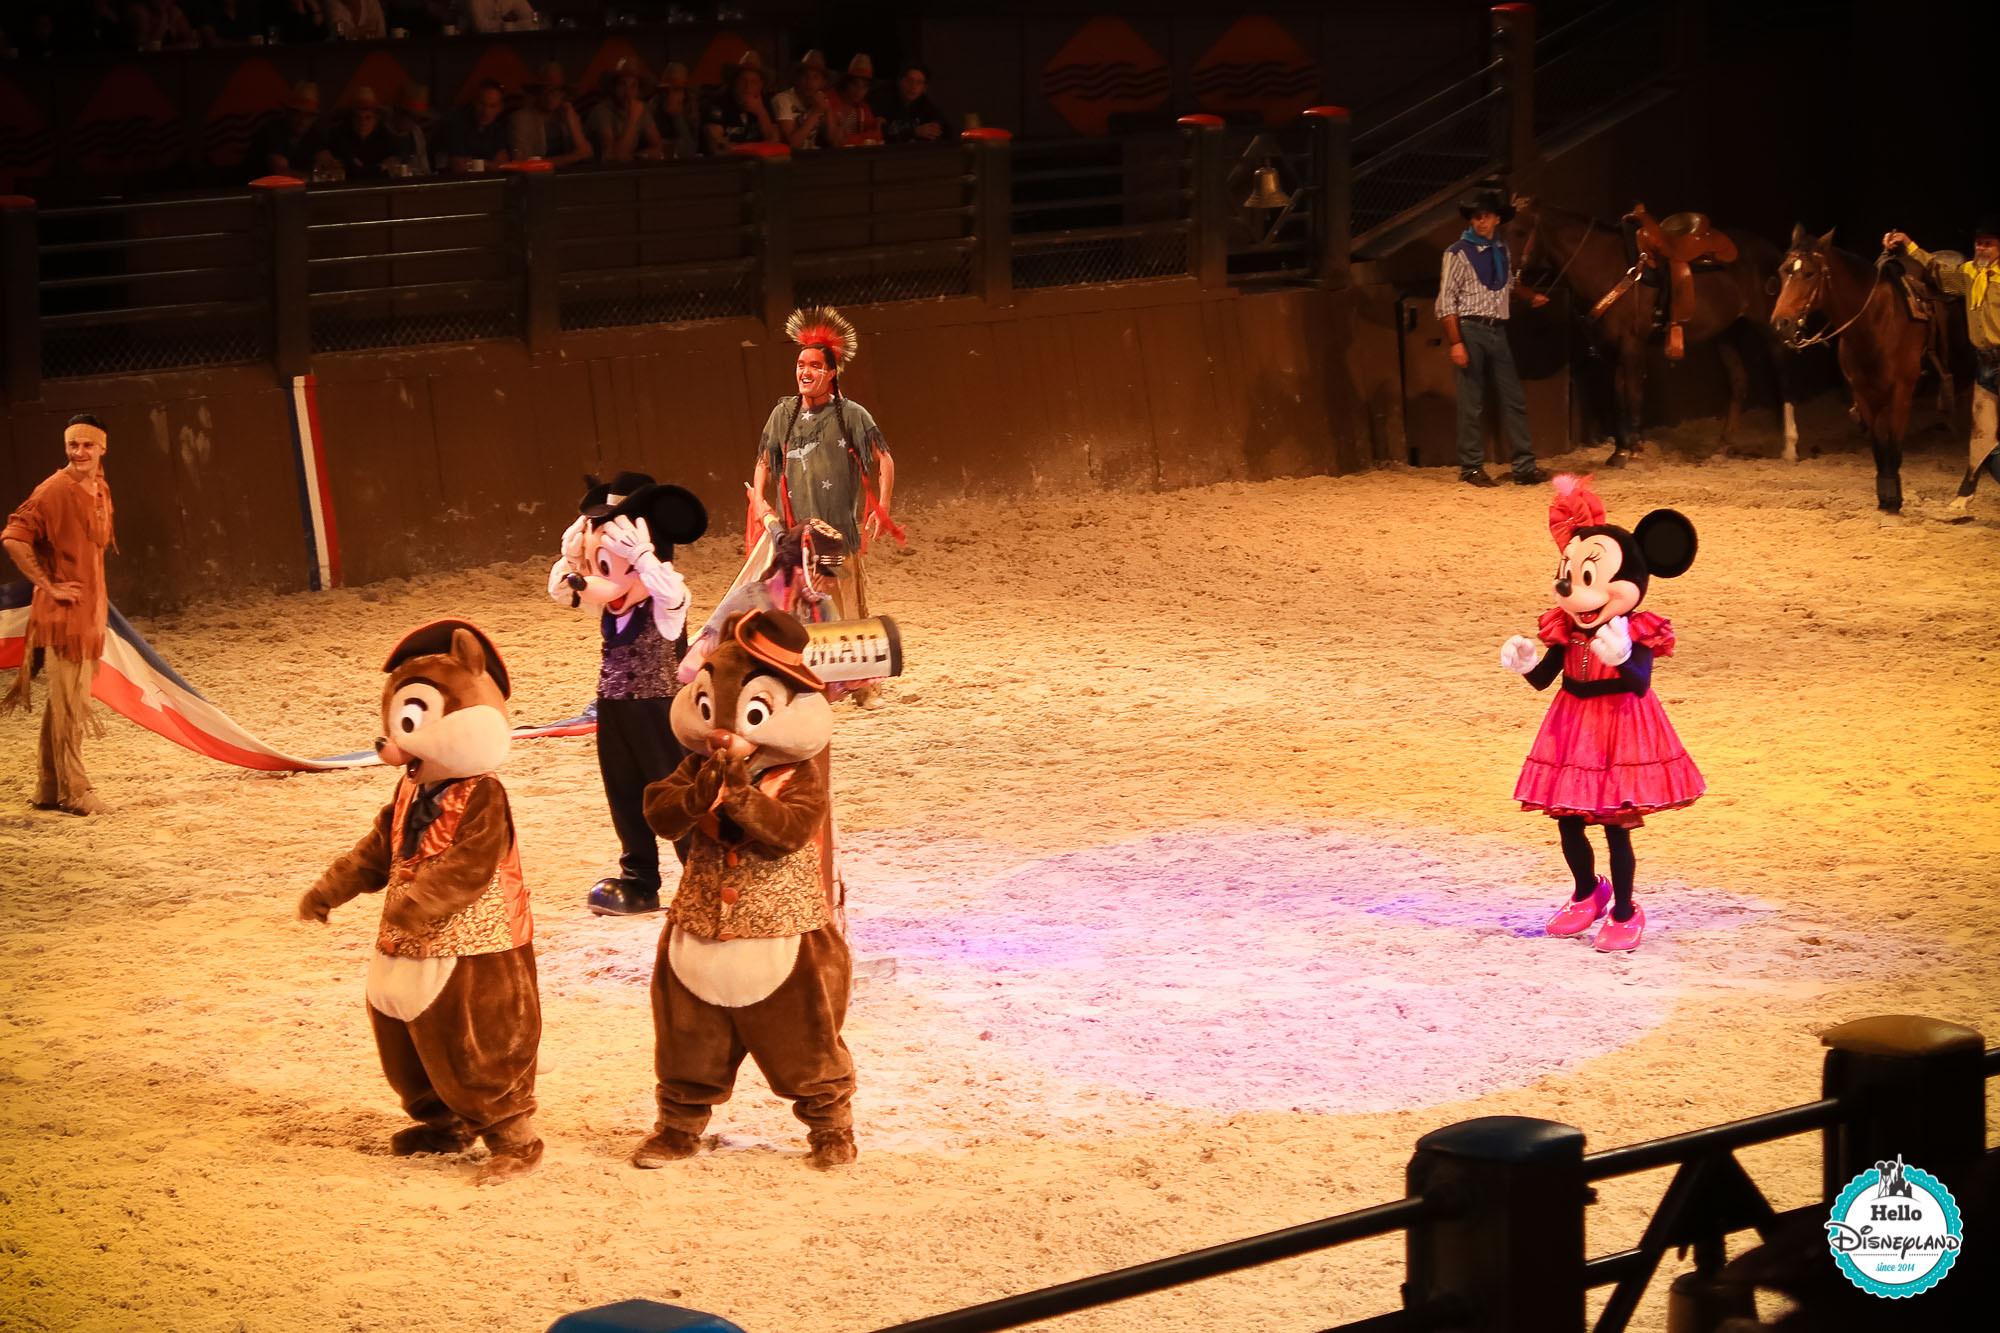 La Légende de Buffalo Bill avec Mickey et ses amis